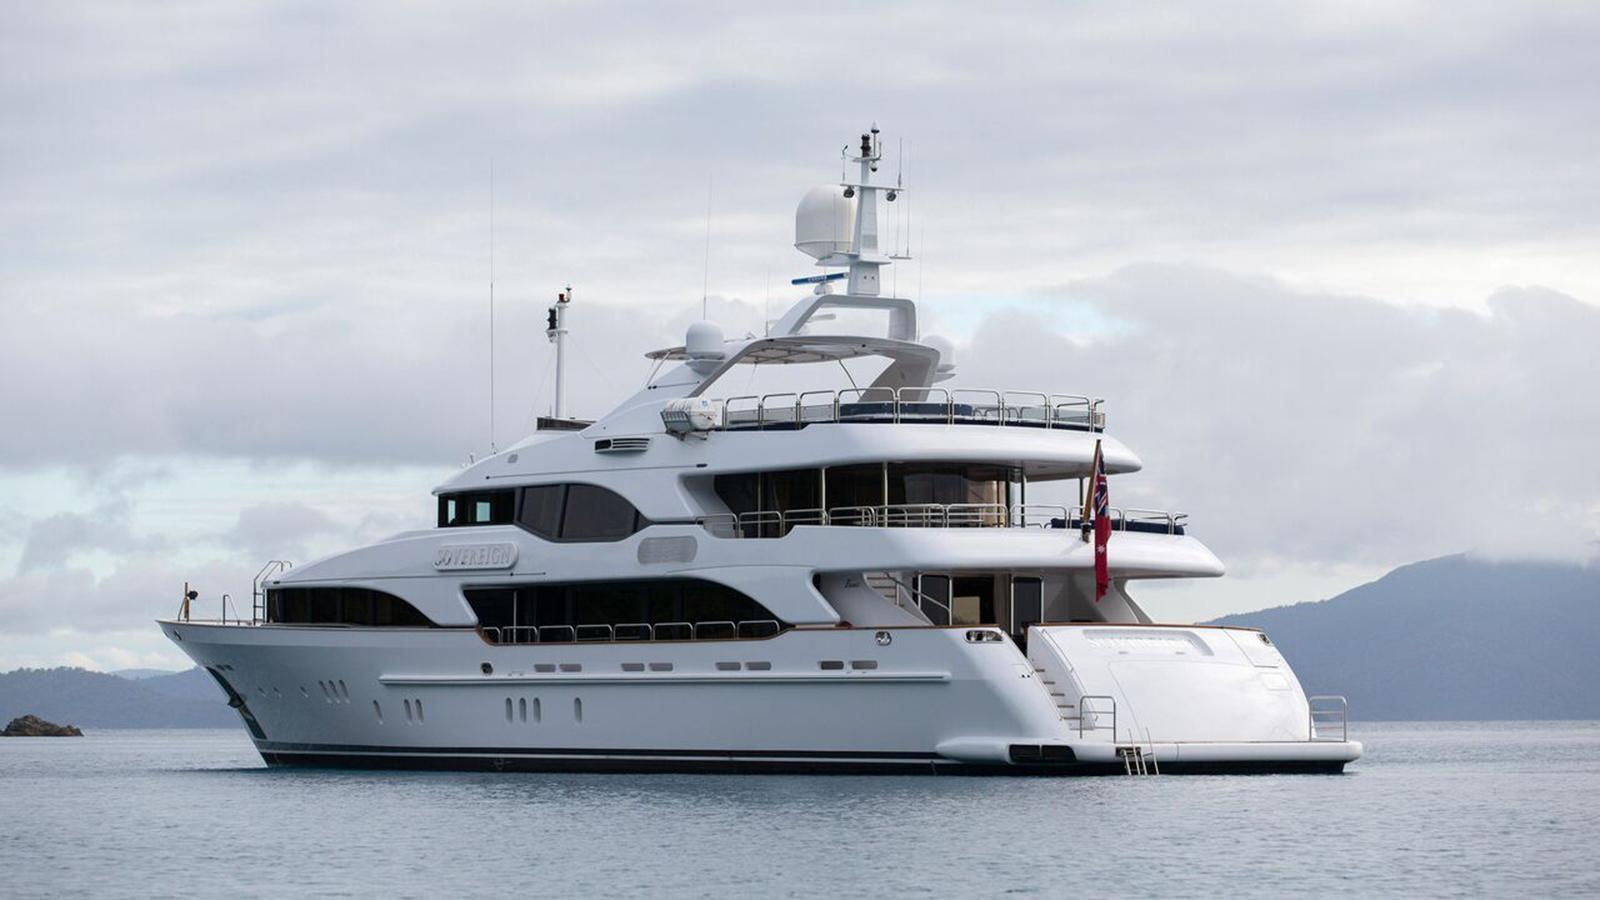 sovereign-motor-yacht-benetti-2002-44m-half-profile-stern